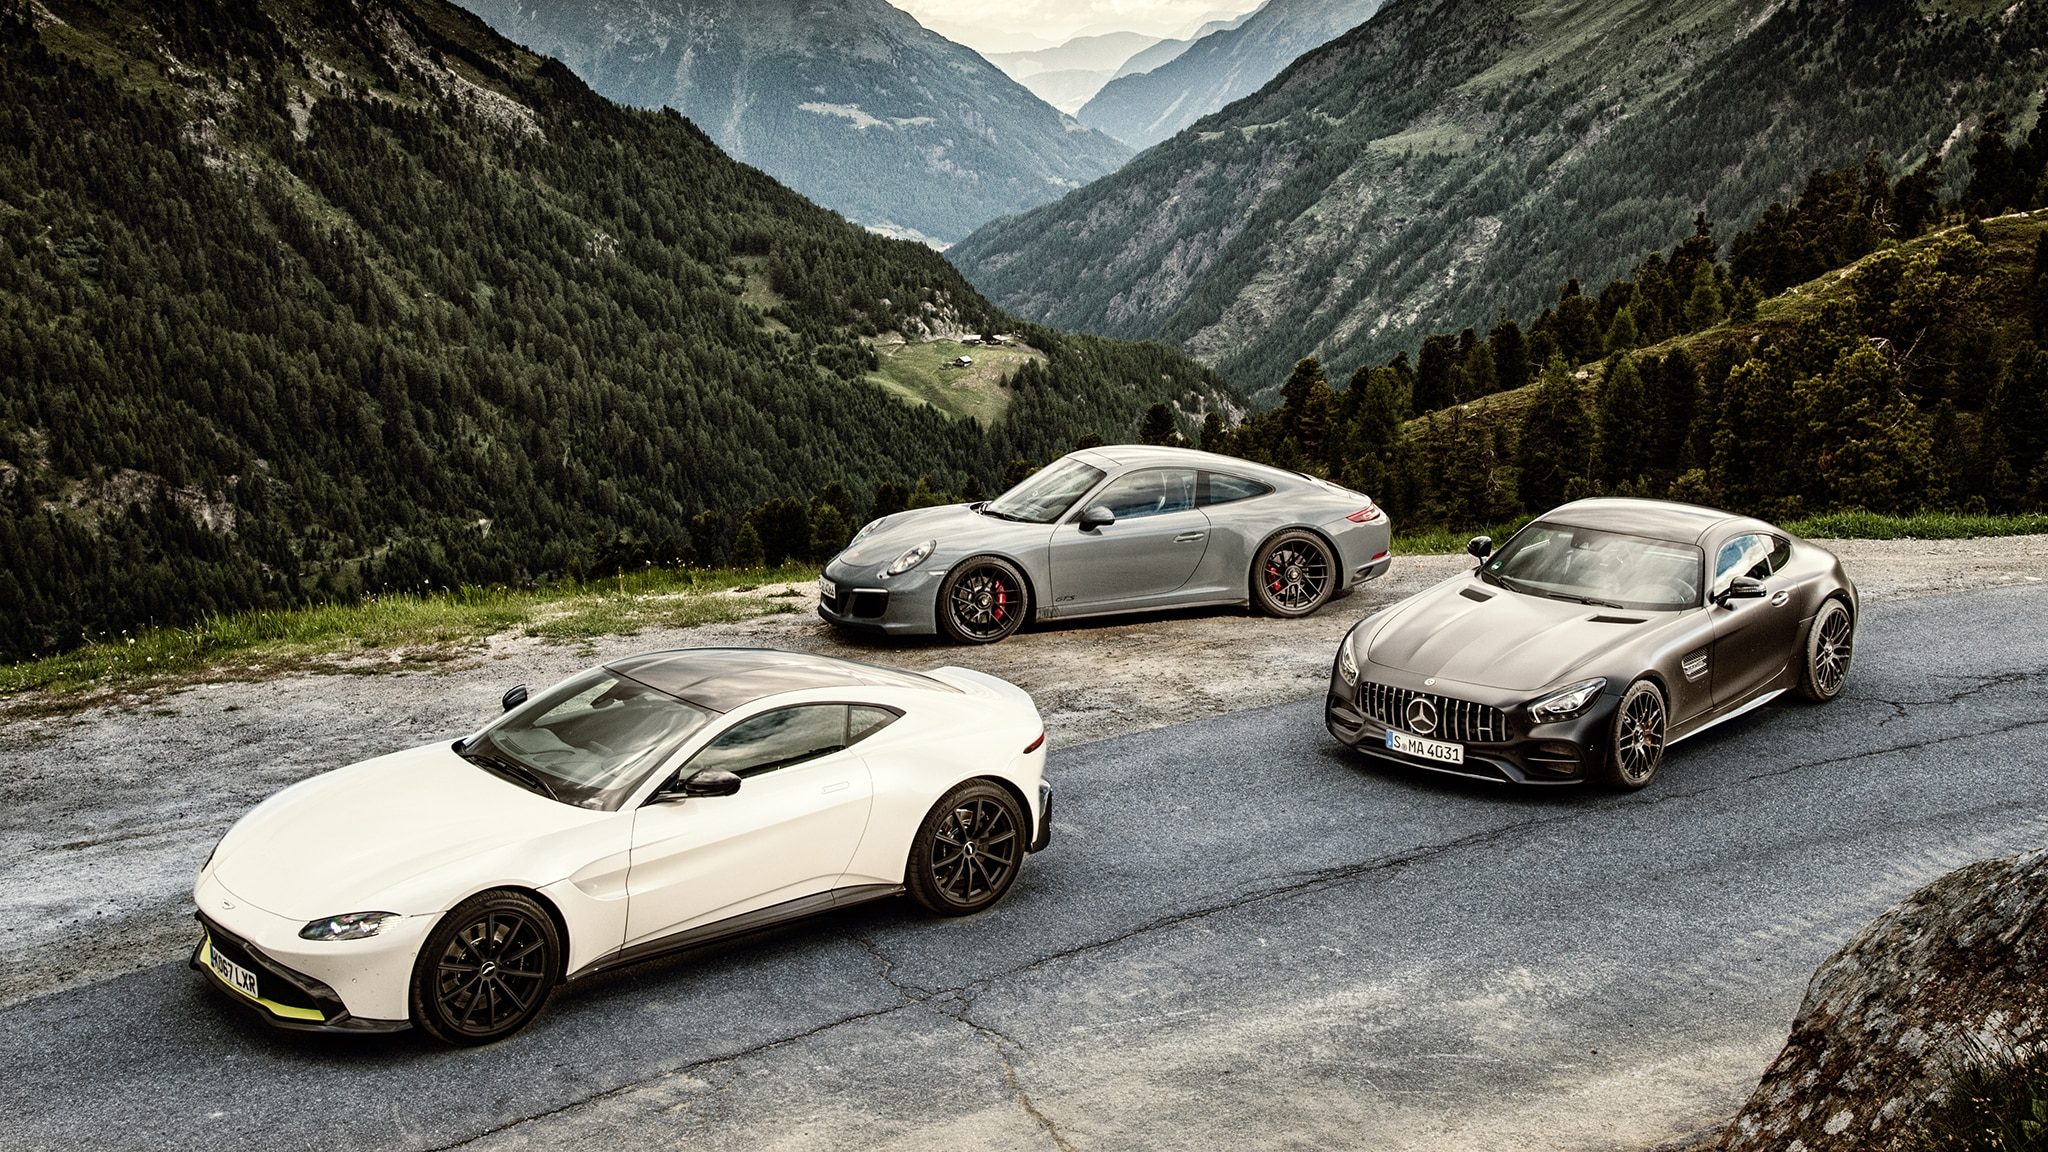 Alpine Shootout Aston Martin V8 Vantage Vs Mercedes Amg Gt C And 2018 Porsche 911 Gts